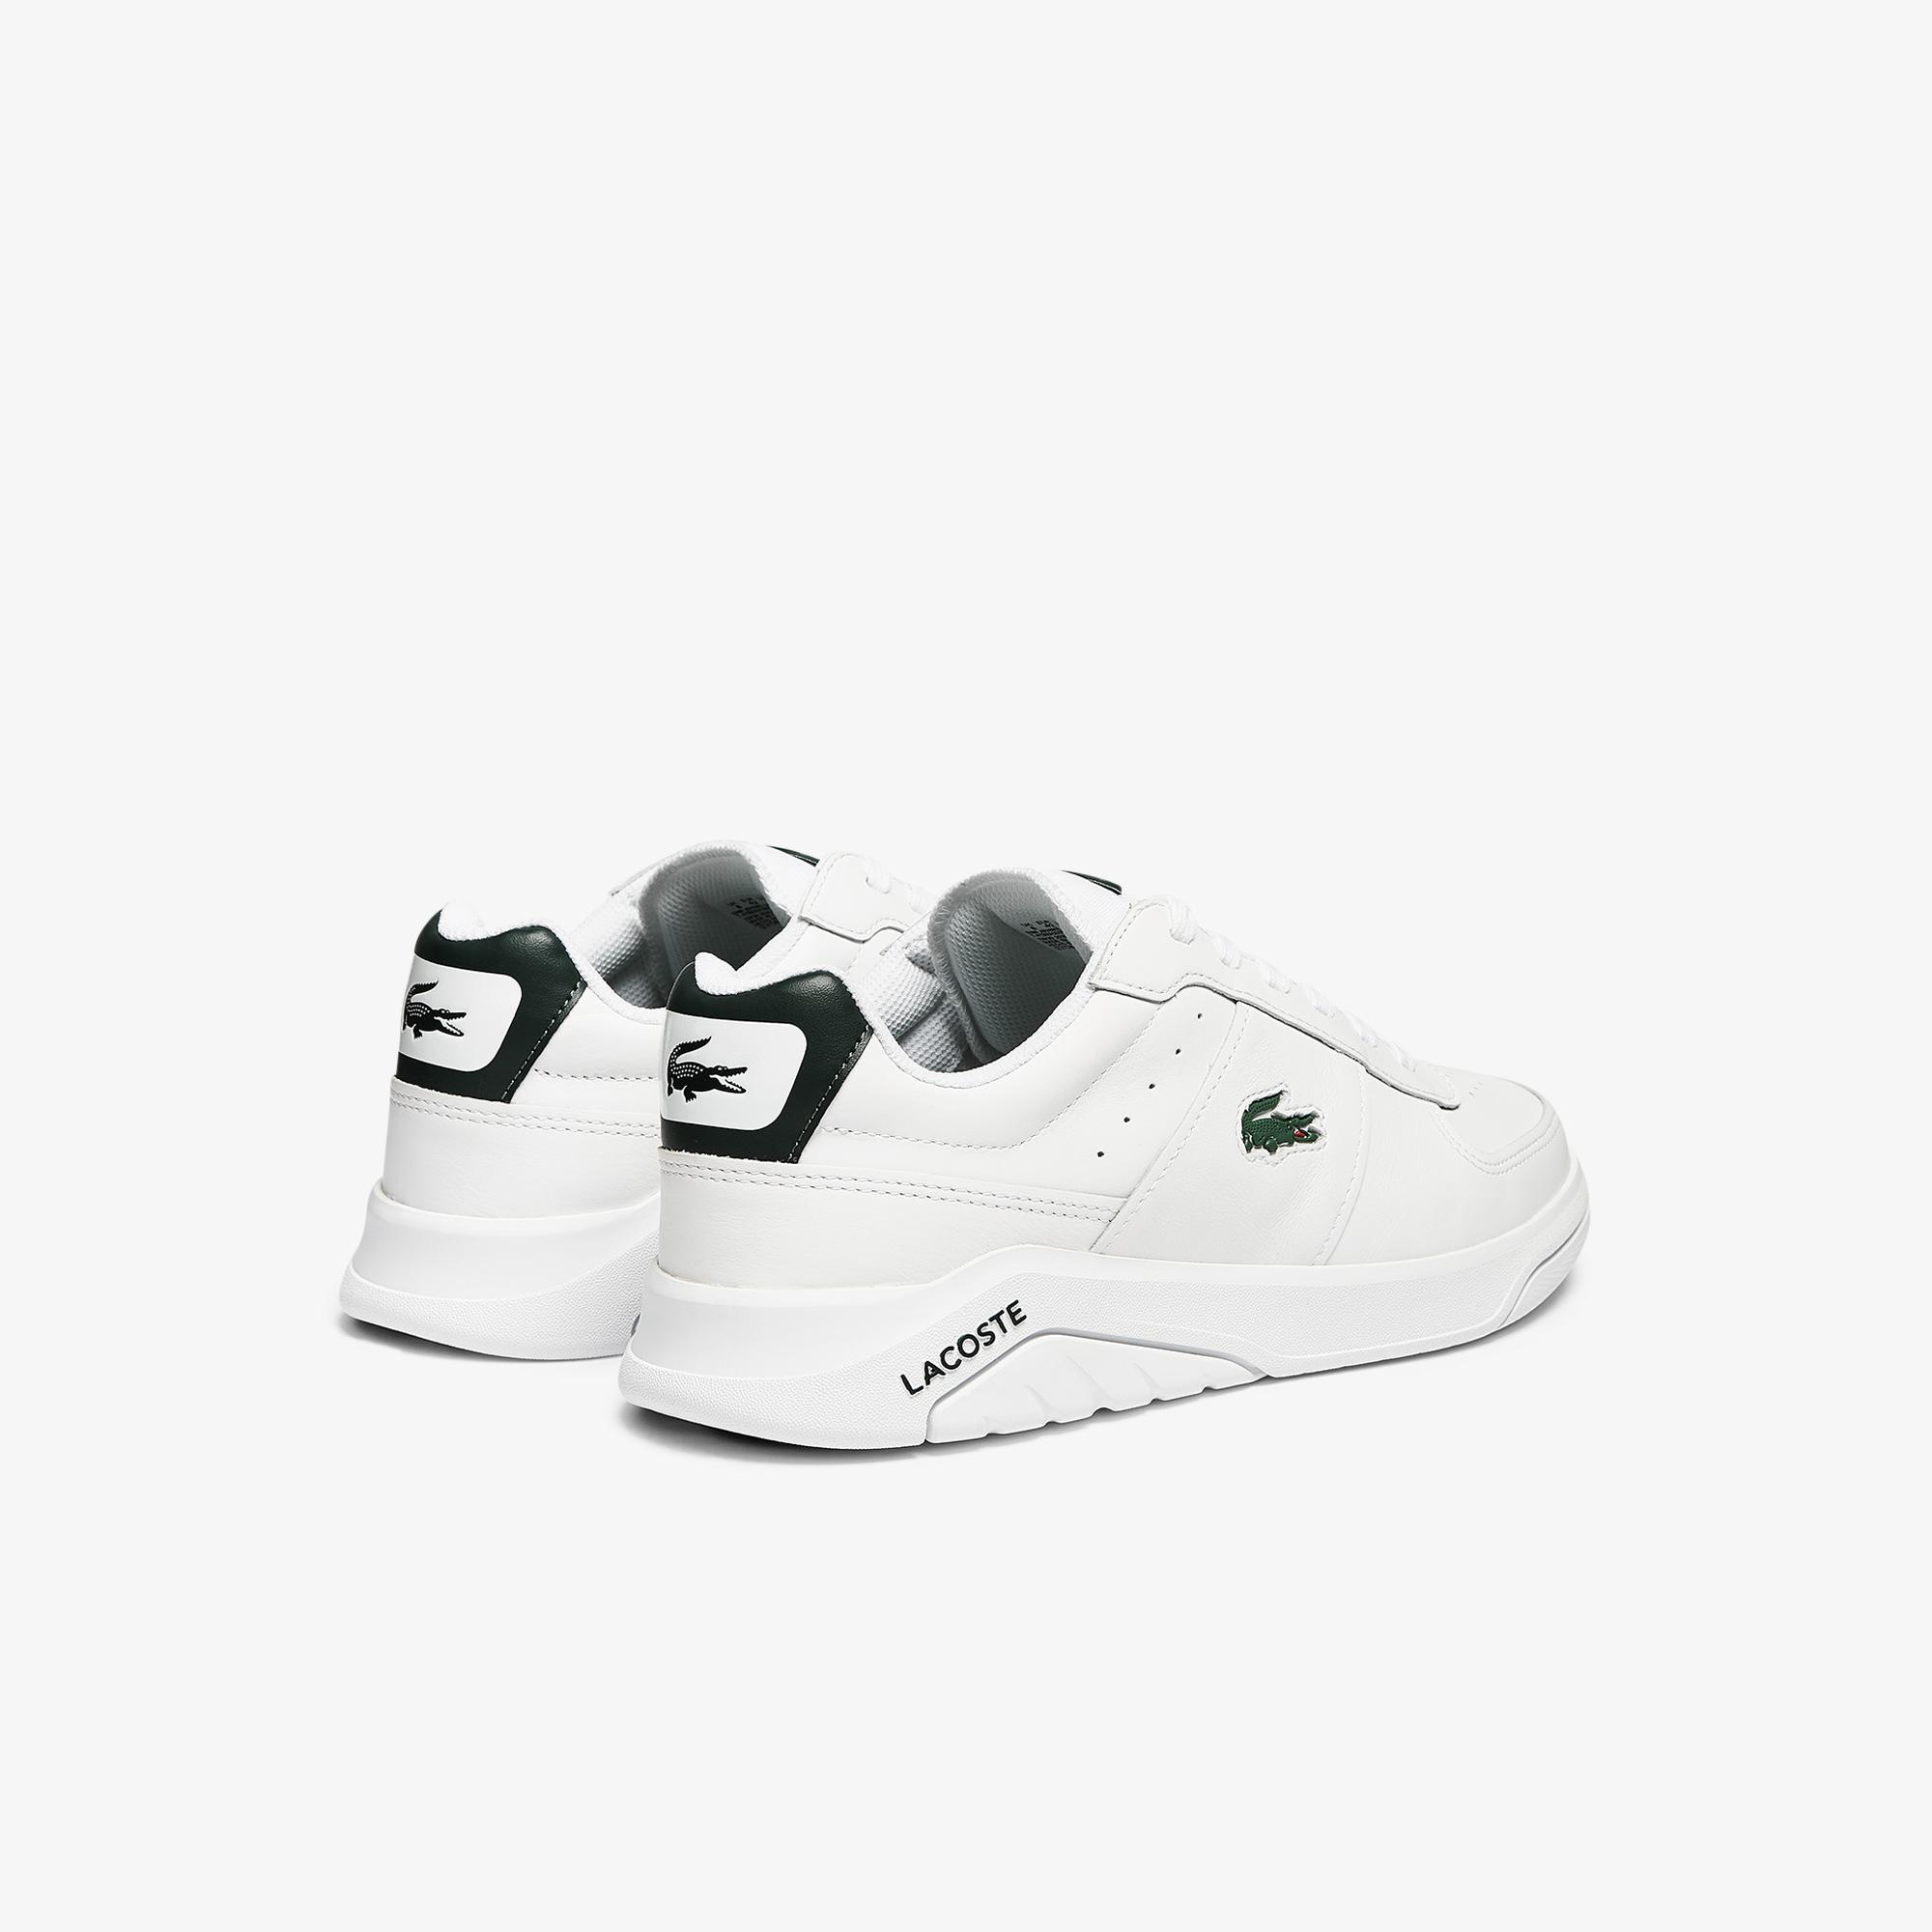 Lacoste Game Advance 0721 2 Sma Erkek Beyaz - Koyu Yeşil Sneaker